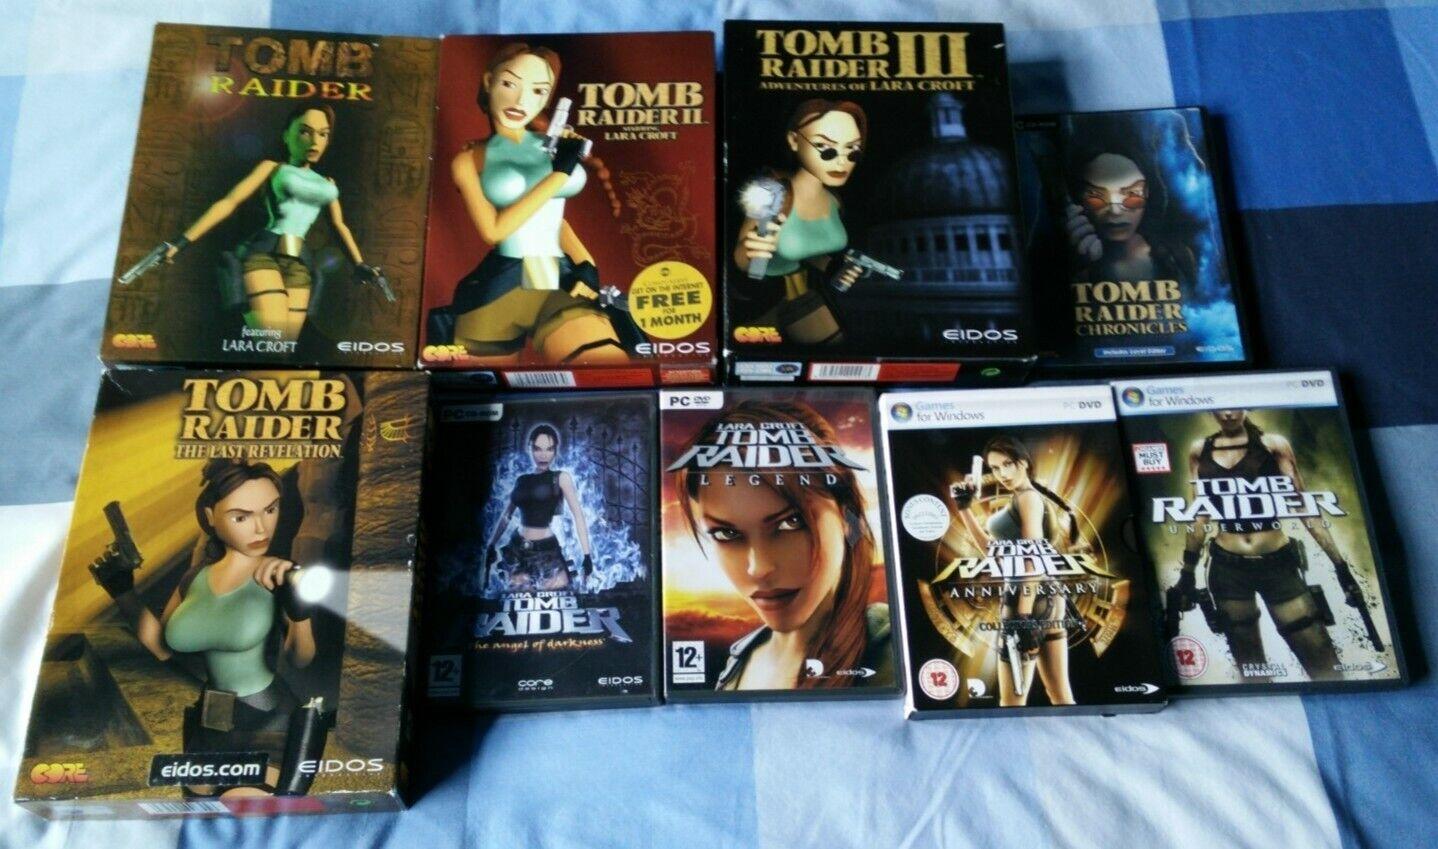 Tomb Raider The Greatest Raids PC DVD